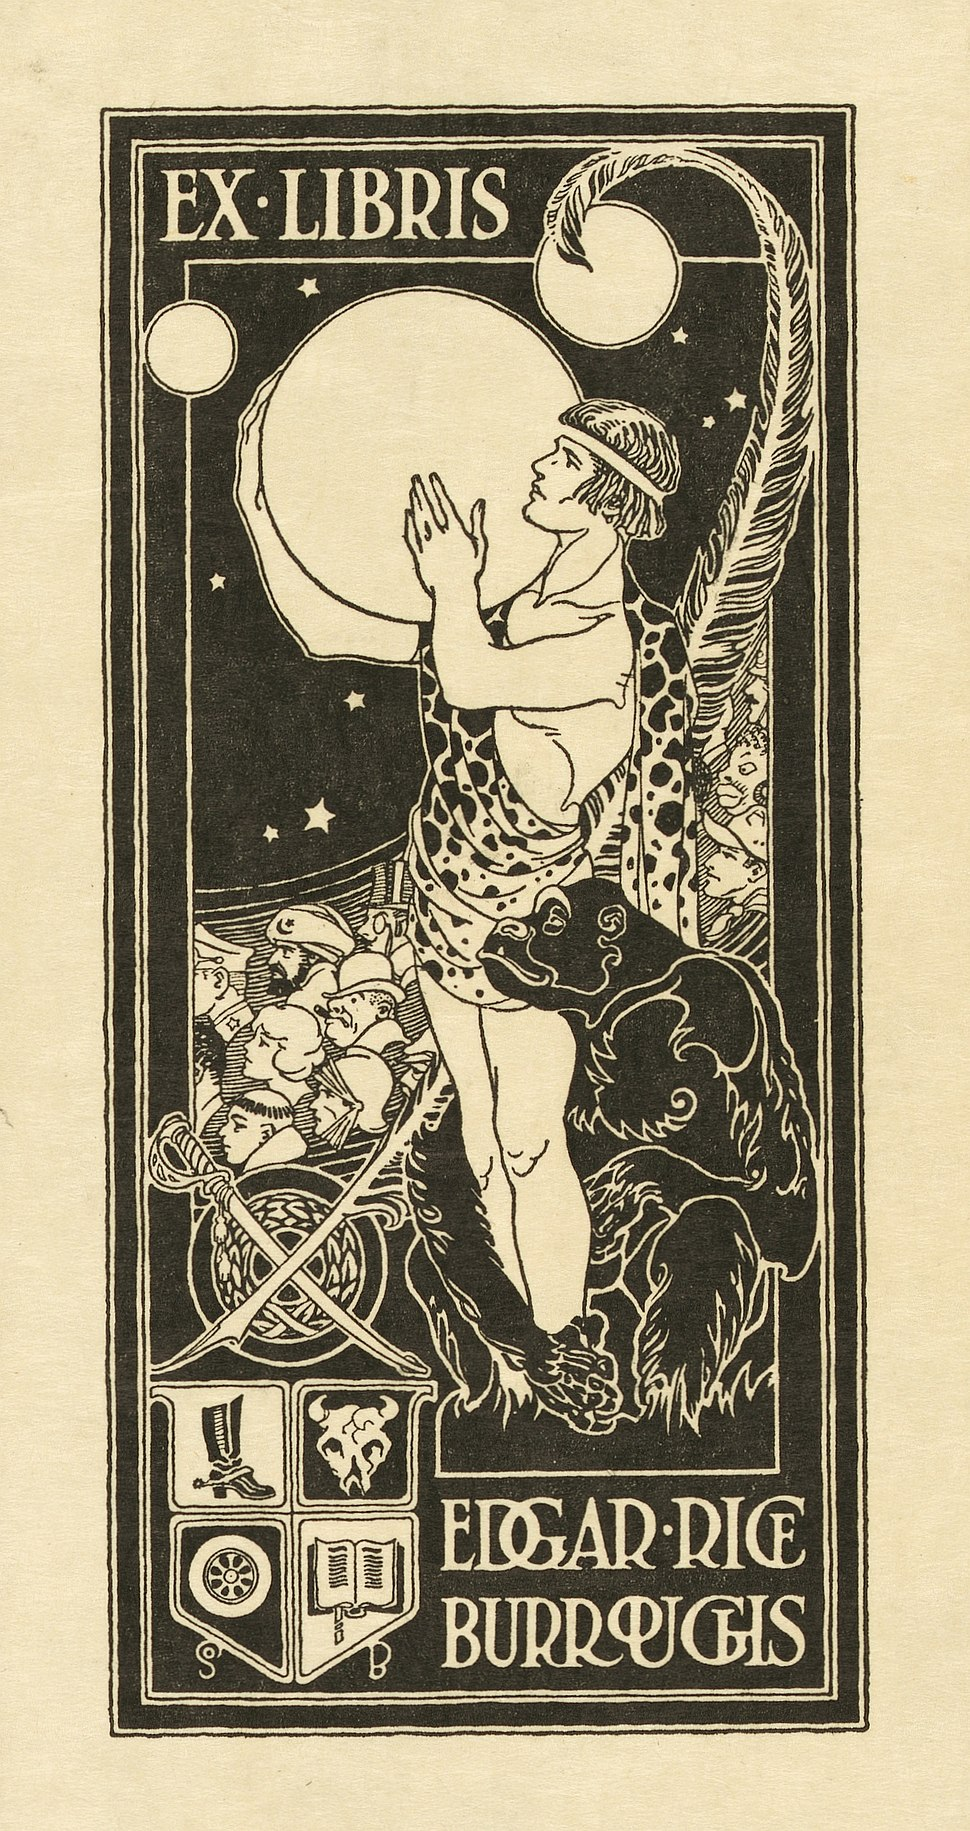 Bookplate of Edgar Rice Burroughs